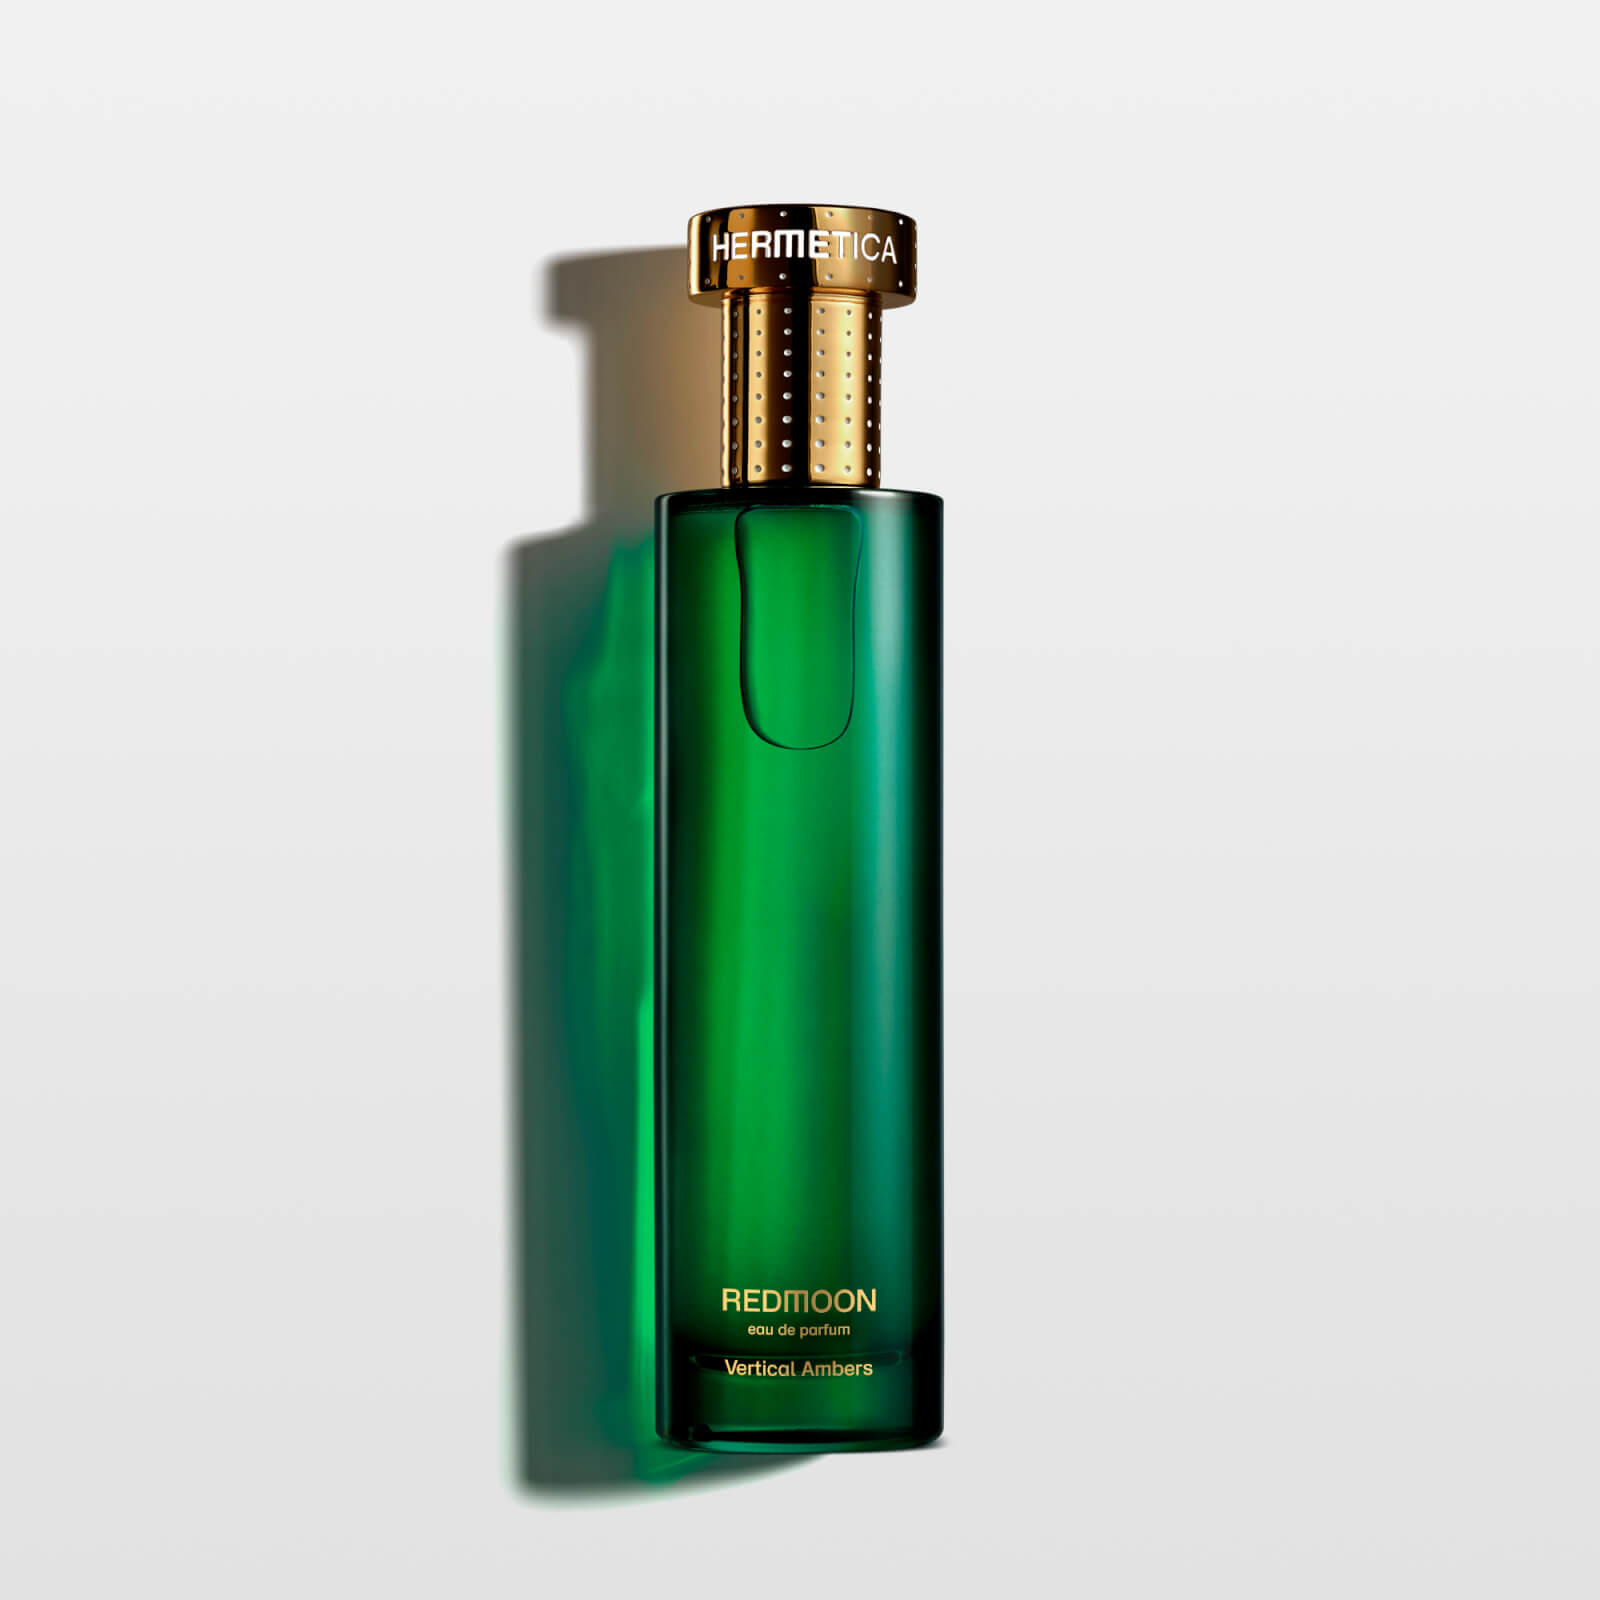 Hermetica Redmooon Eau de Parfum (Various Sizes) - 100ml